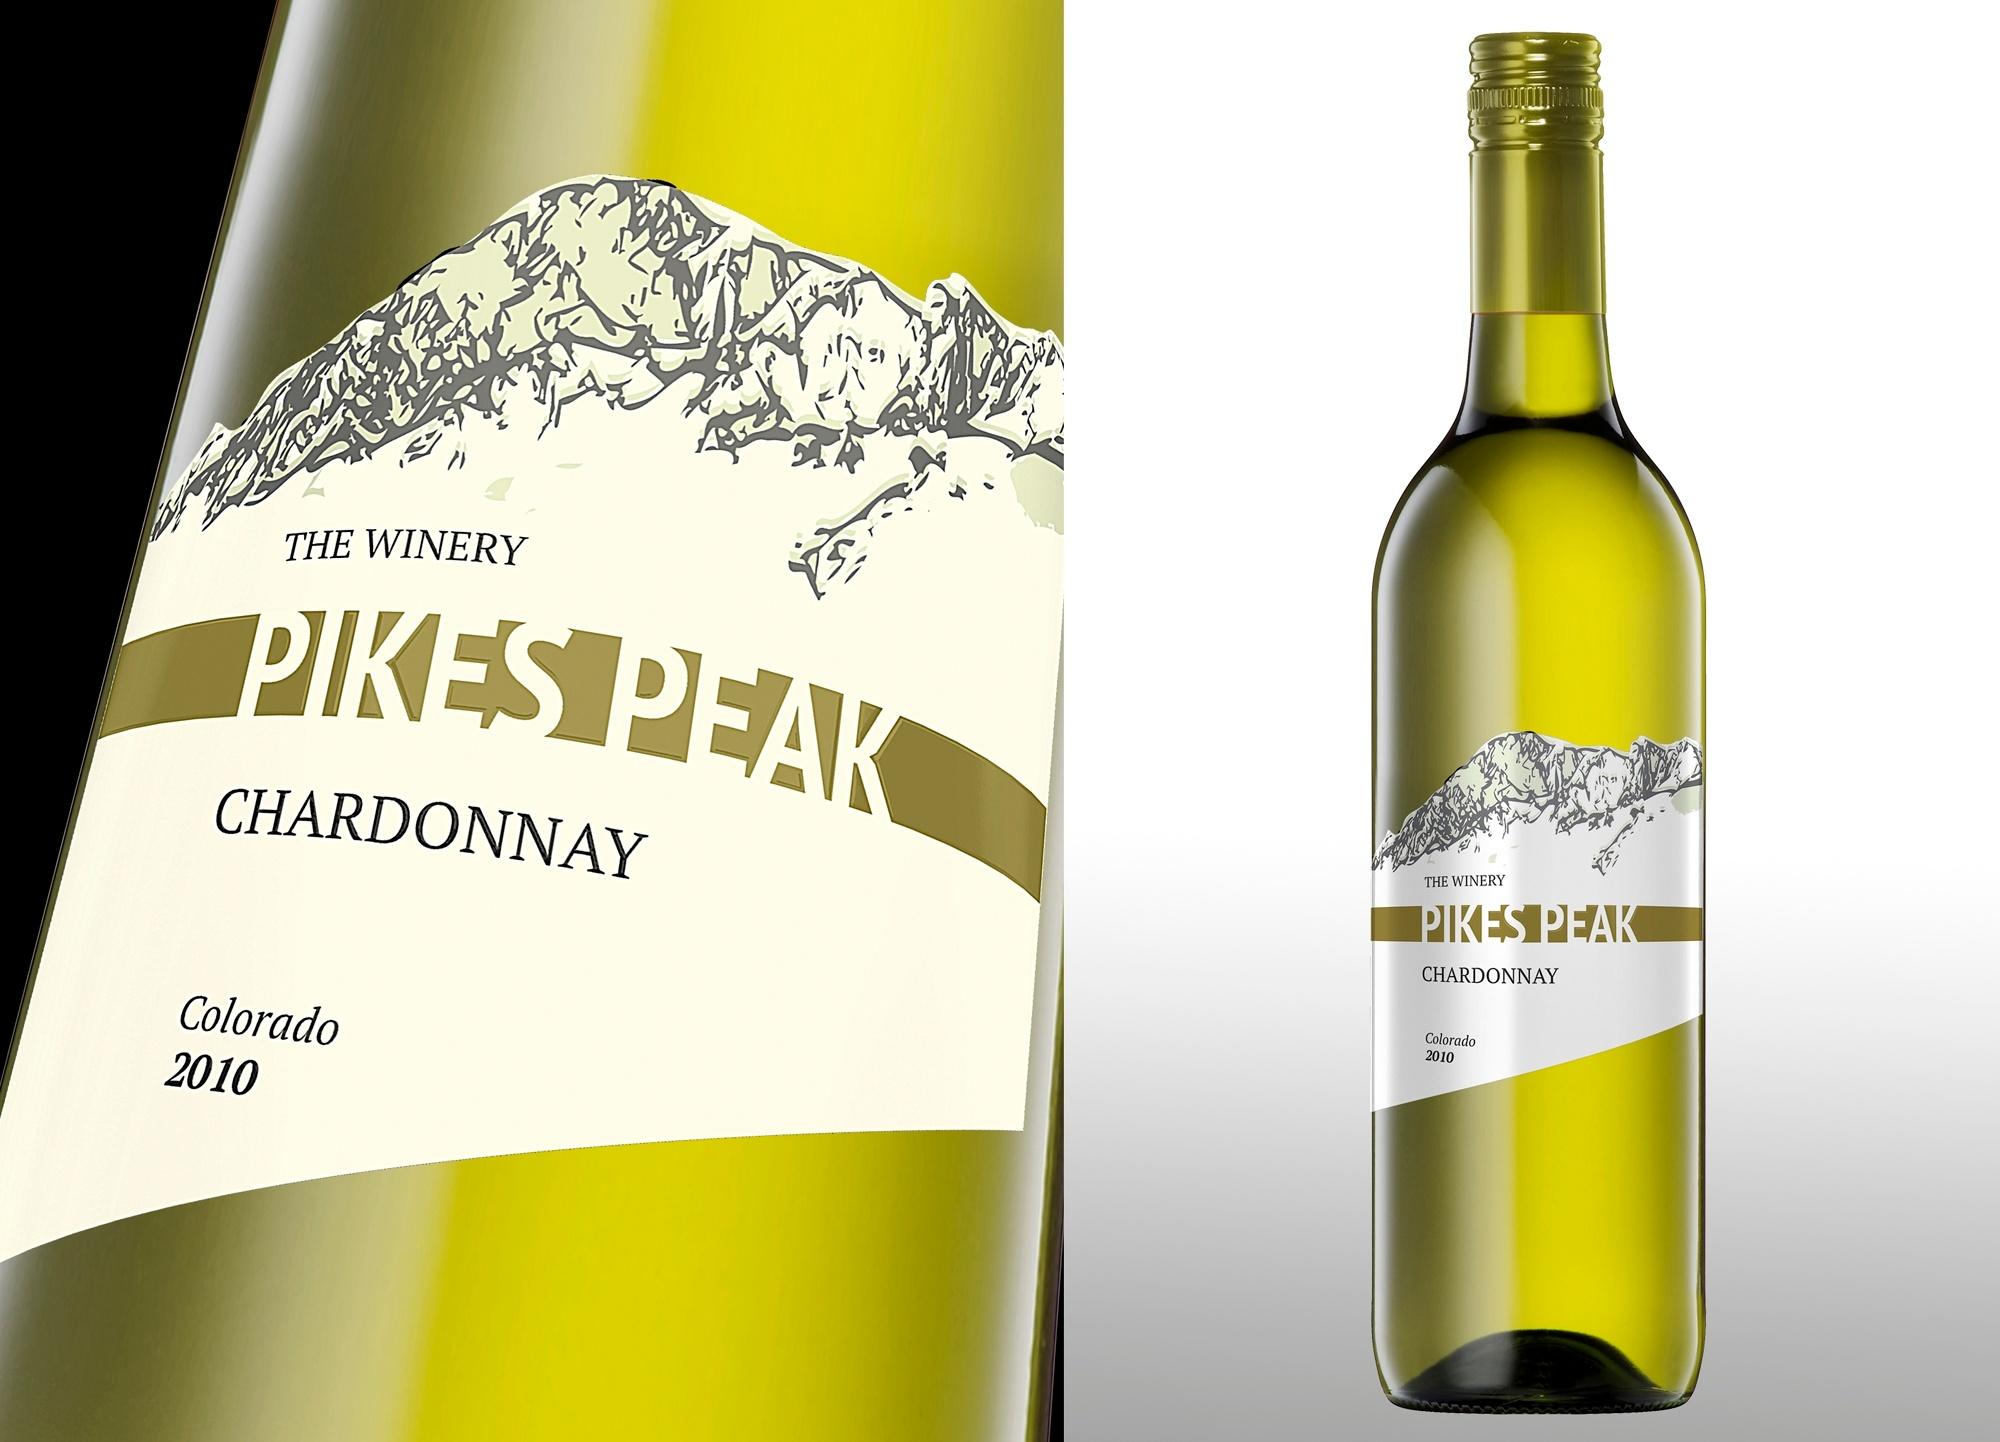 10-eye-catching-wine-label-designs